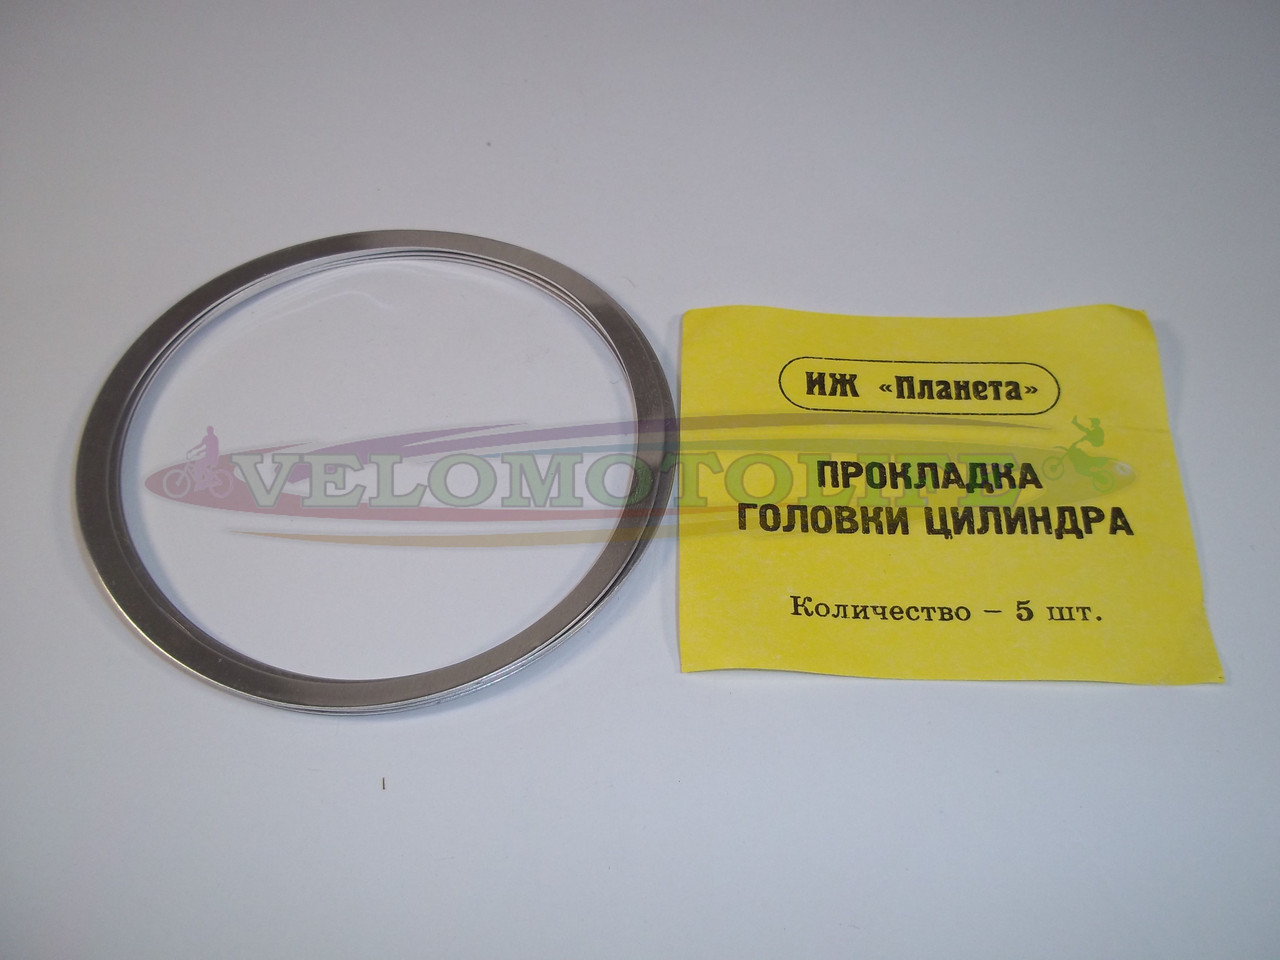 Прокладка головки цилиндра ИЖ-ПЛАНЕТА(алюминий)